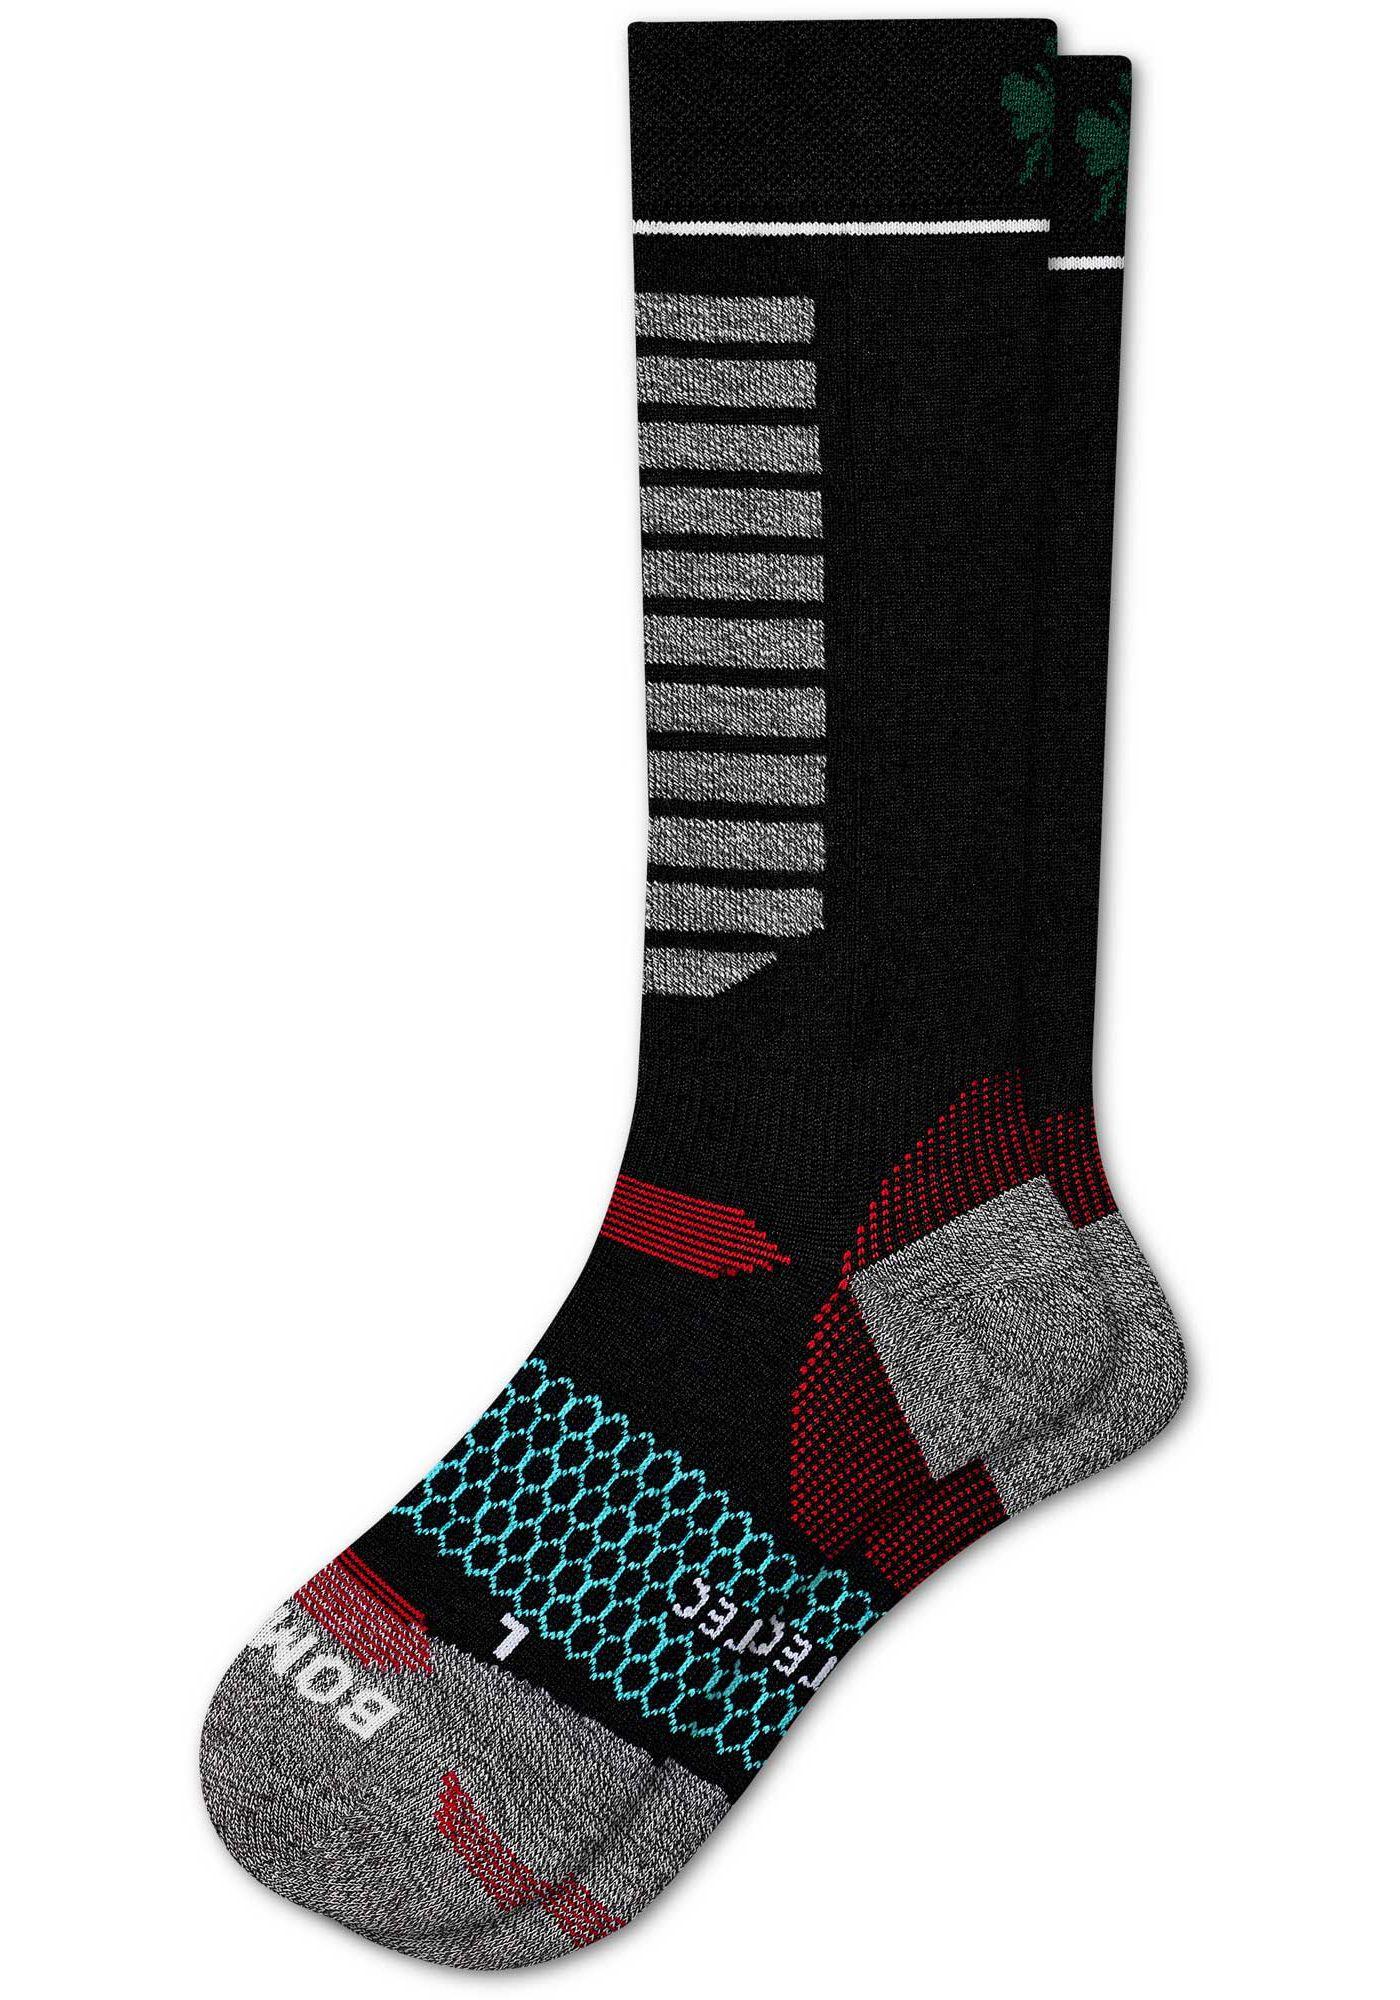 Bombas Lightweight Preformance Socks